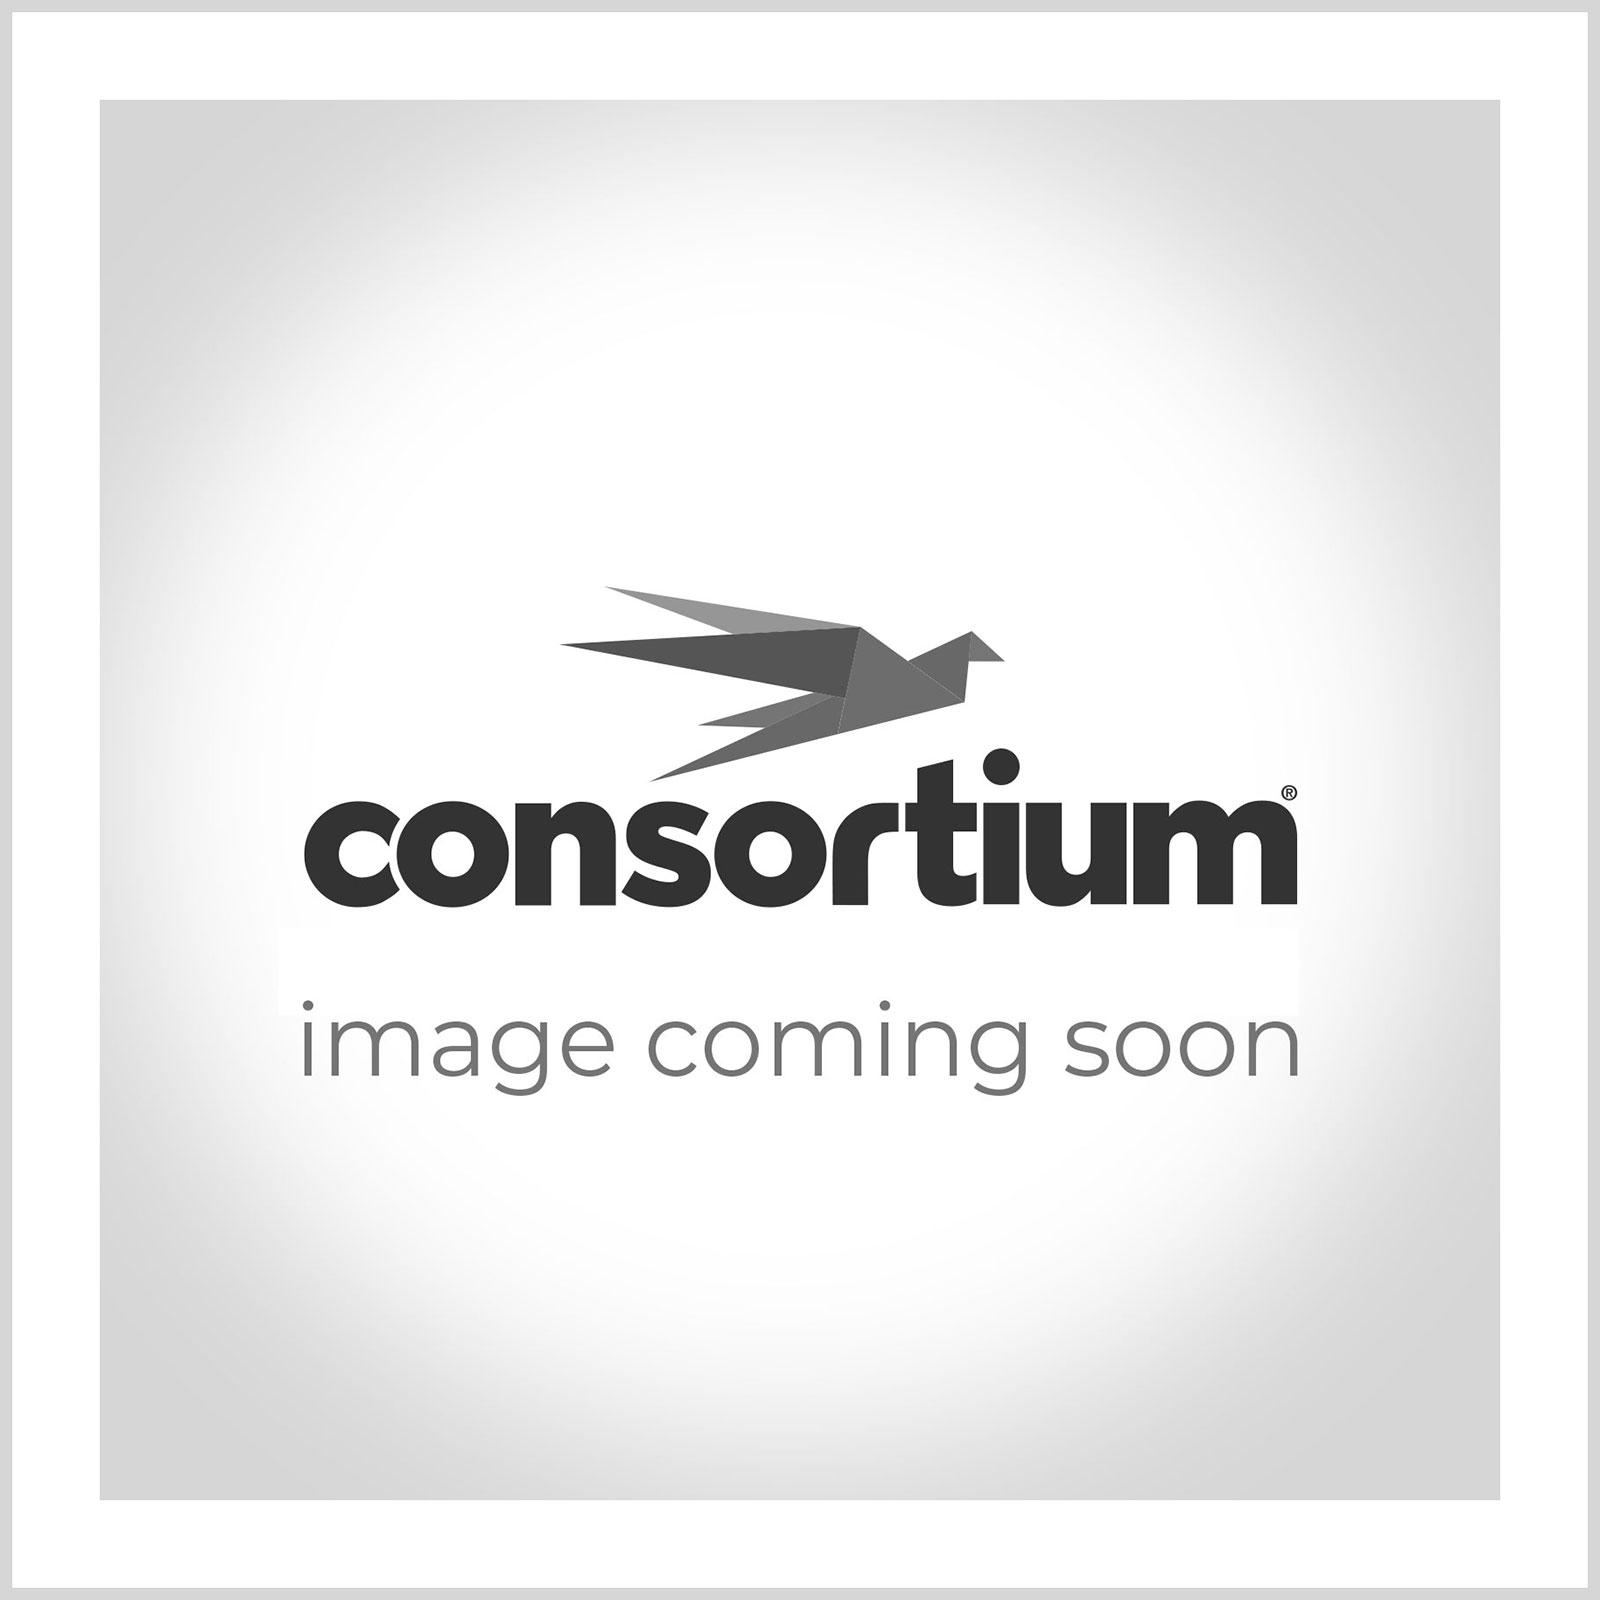 Manilla Envelopes Other